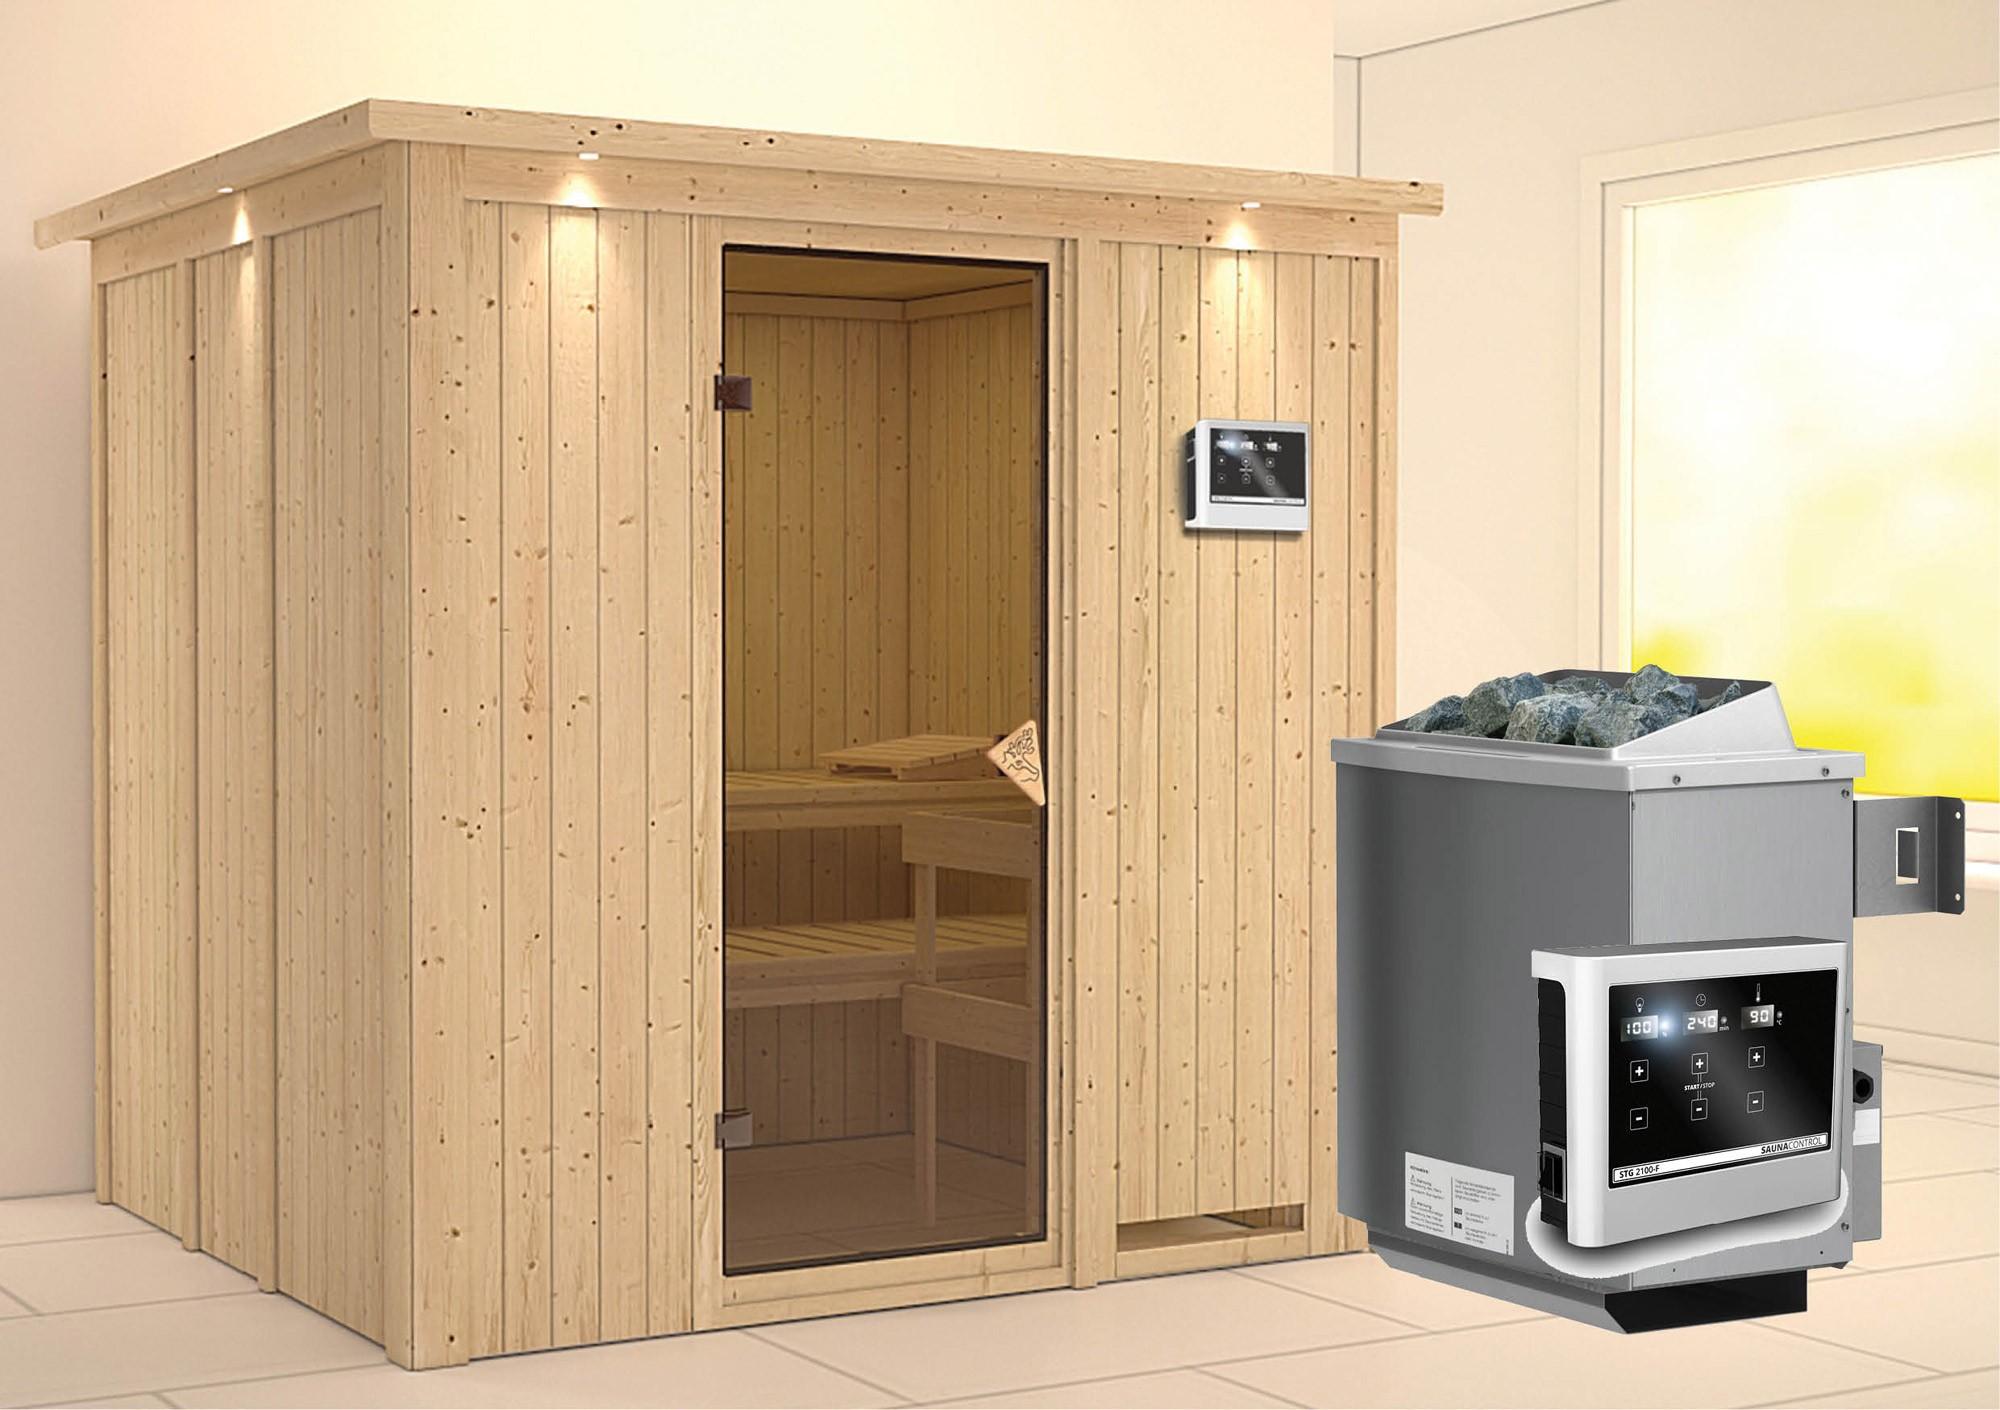 Karibu Sauna Sodin 68mm Dachkranz + Ofen 9kW extern classic Tür Bild 1